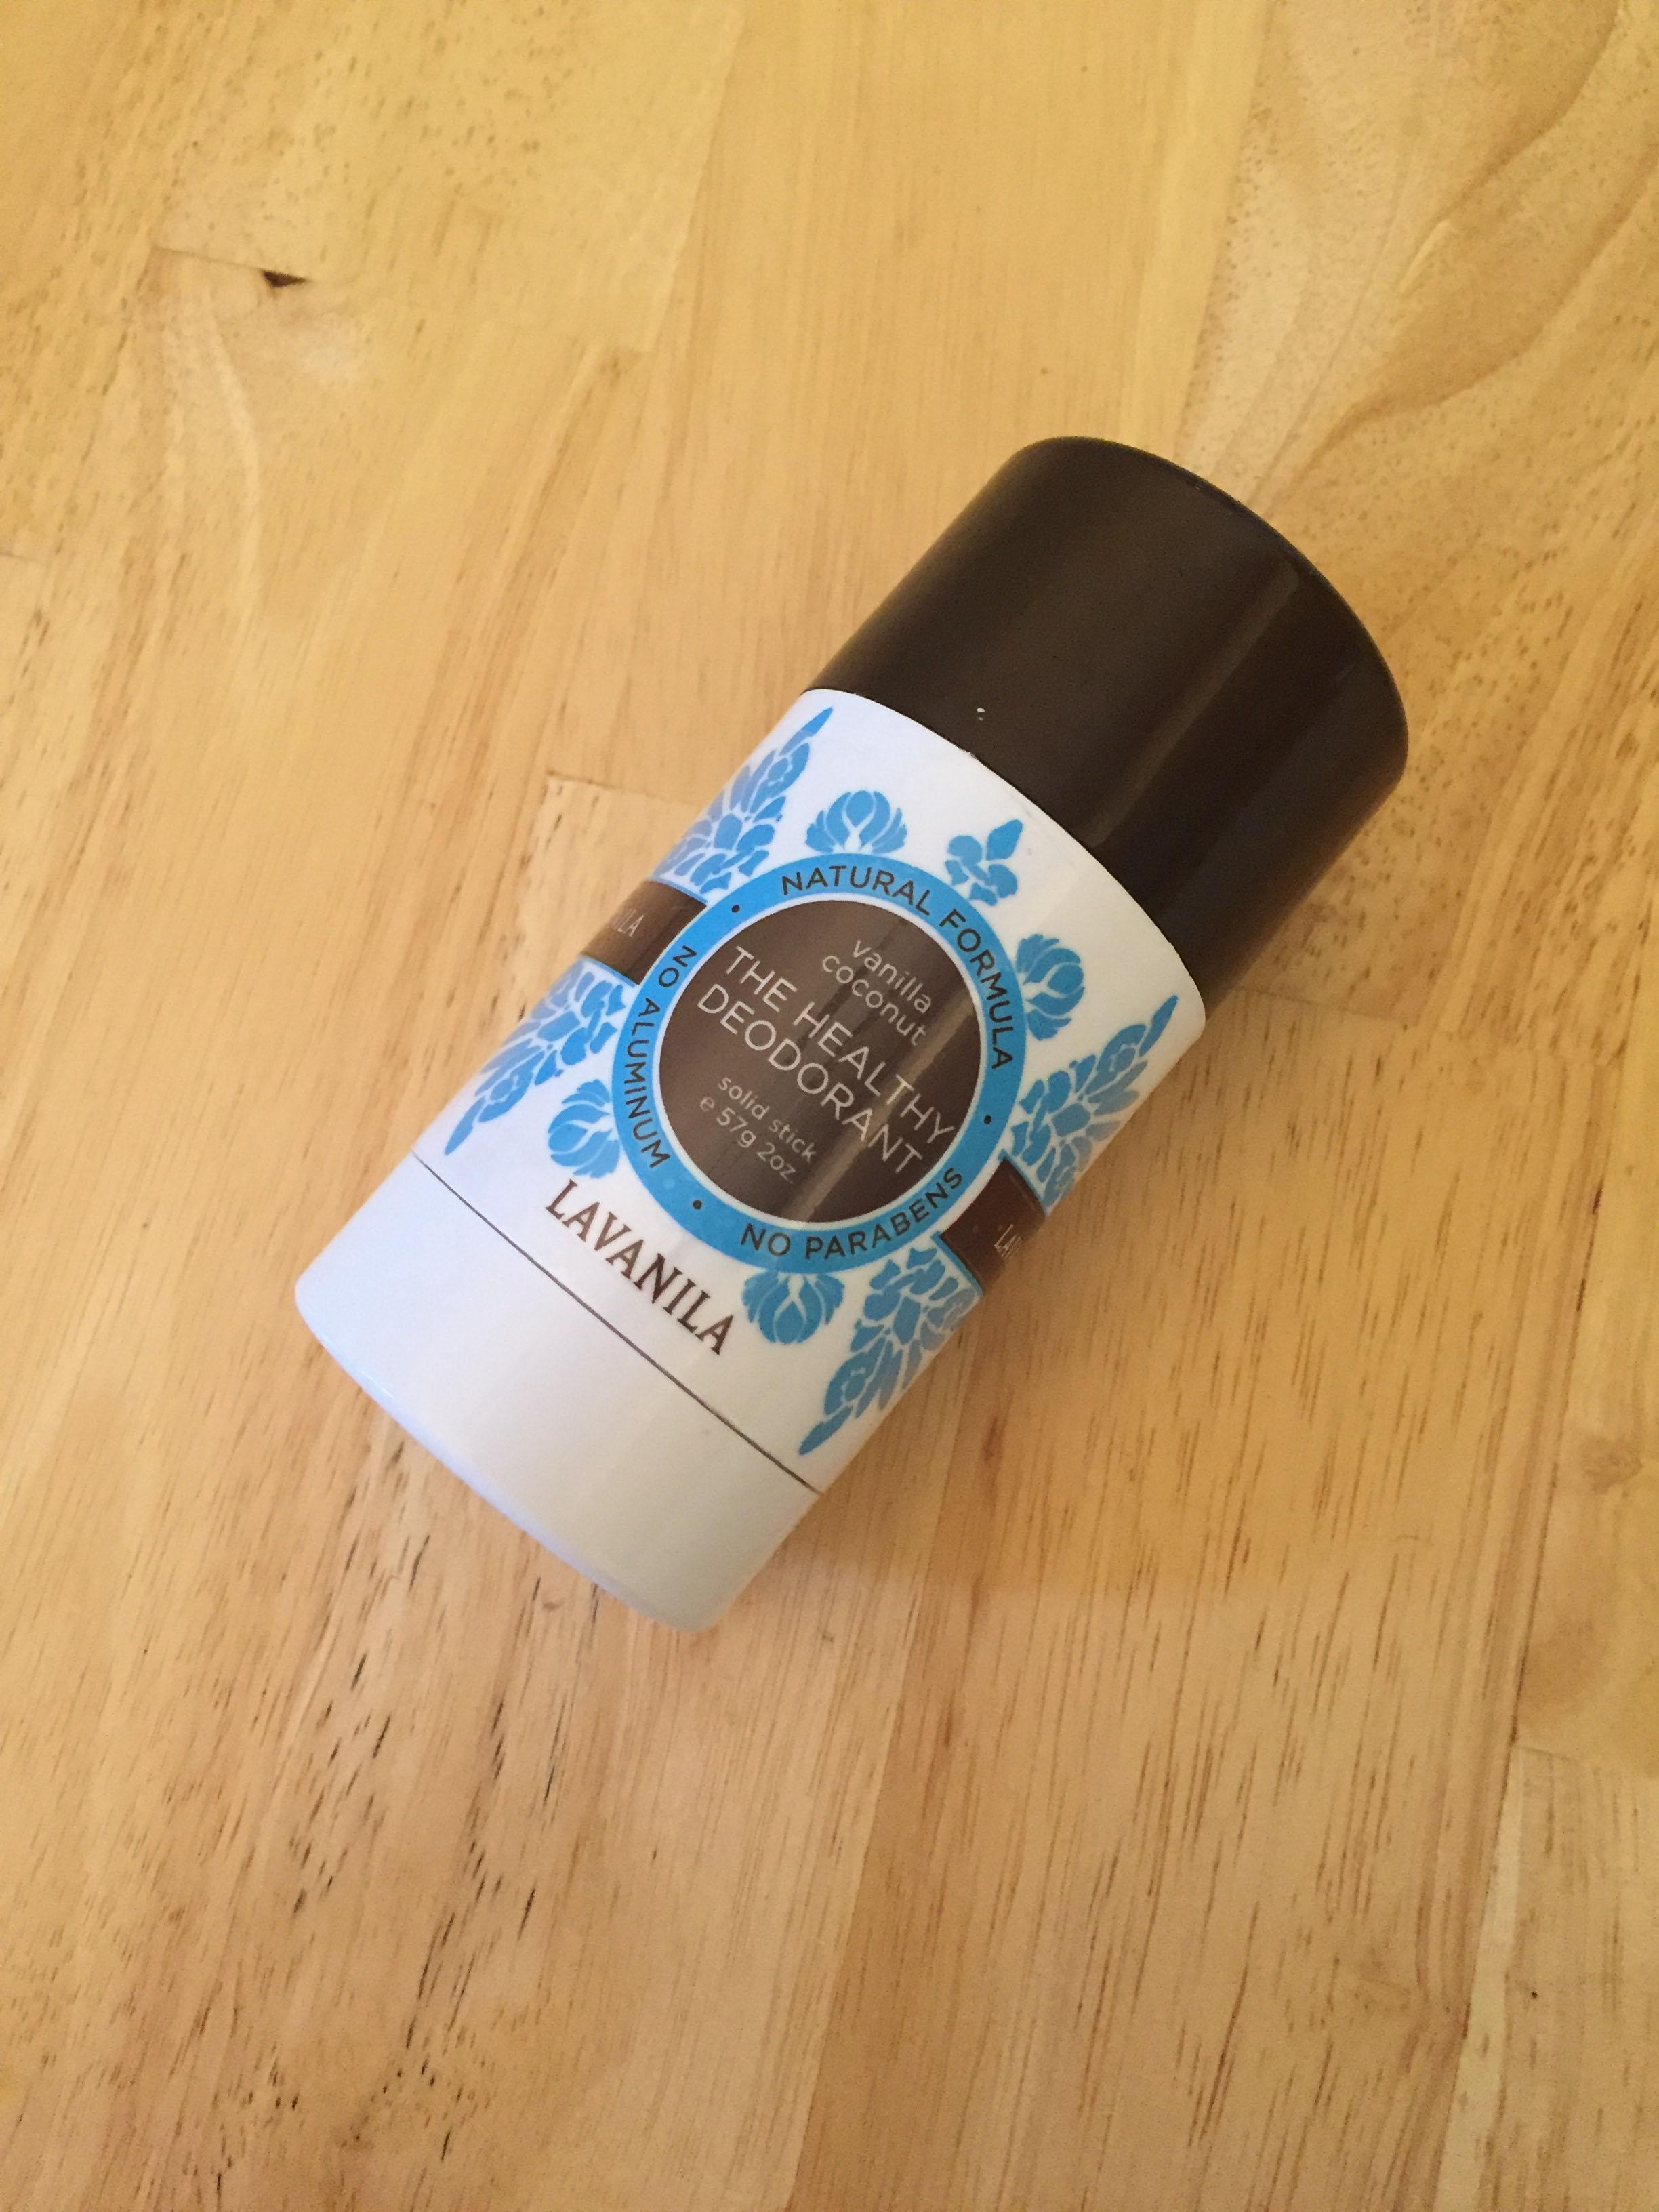 Lavanila The Healthy Deodorant Review | Laurel and Iron